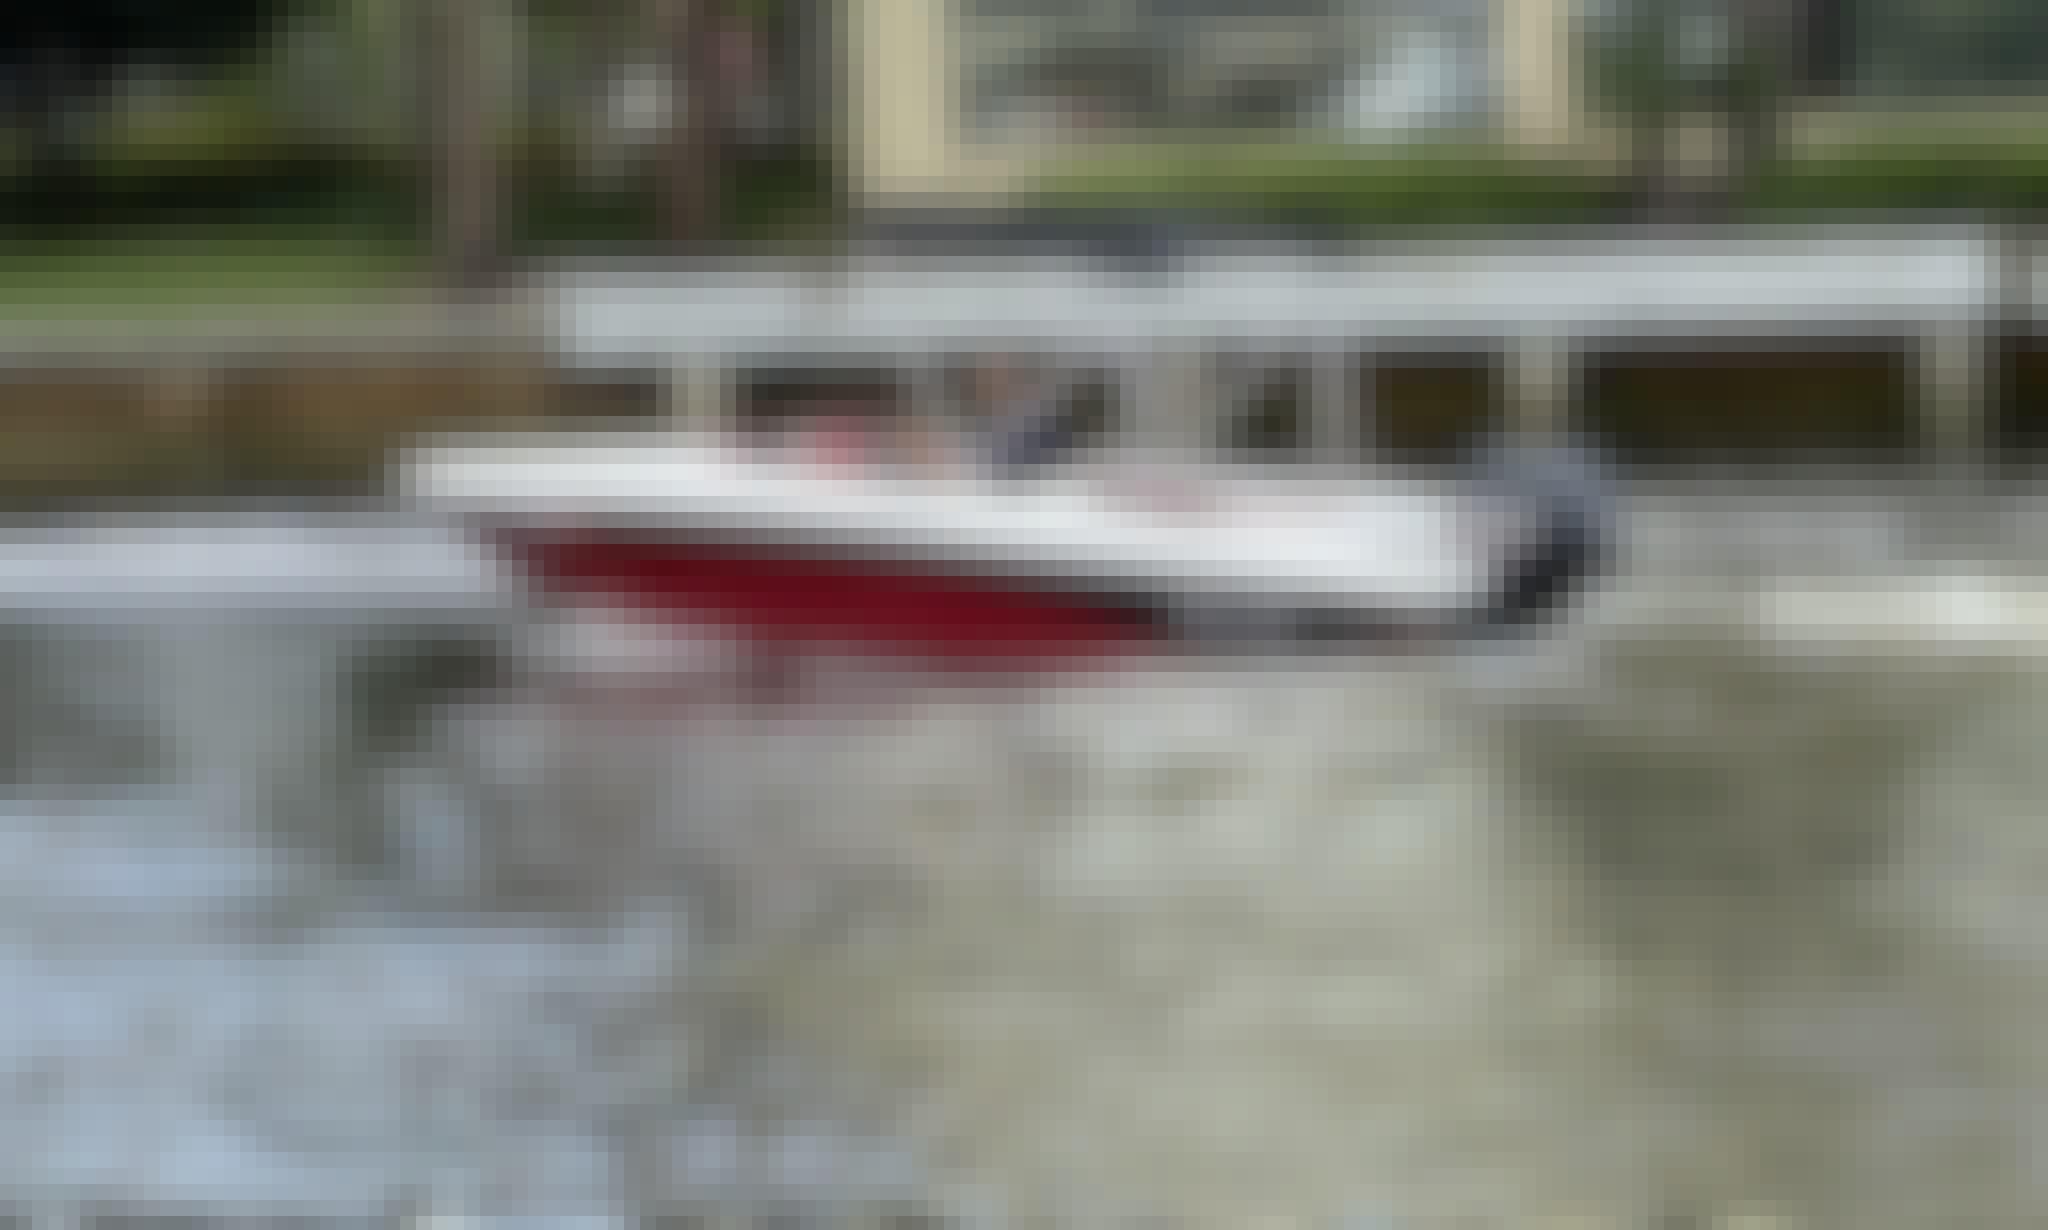 2019 Rinker QX18 OB Bowrider for 8 People in Fort Lauderdale, FL